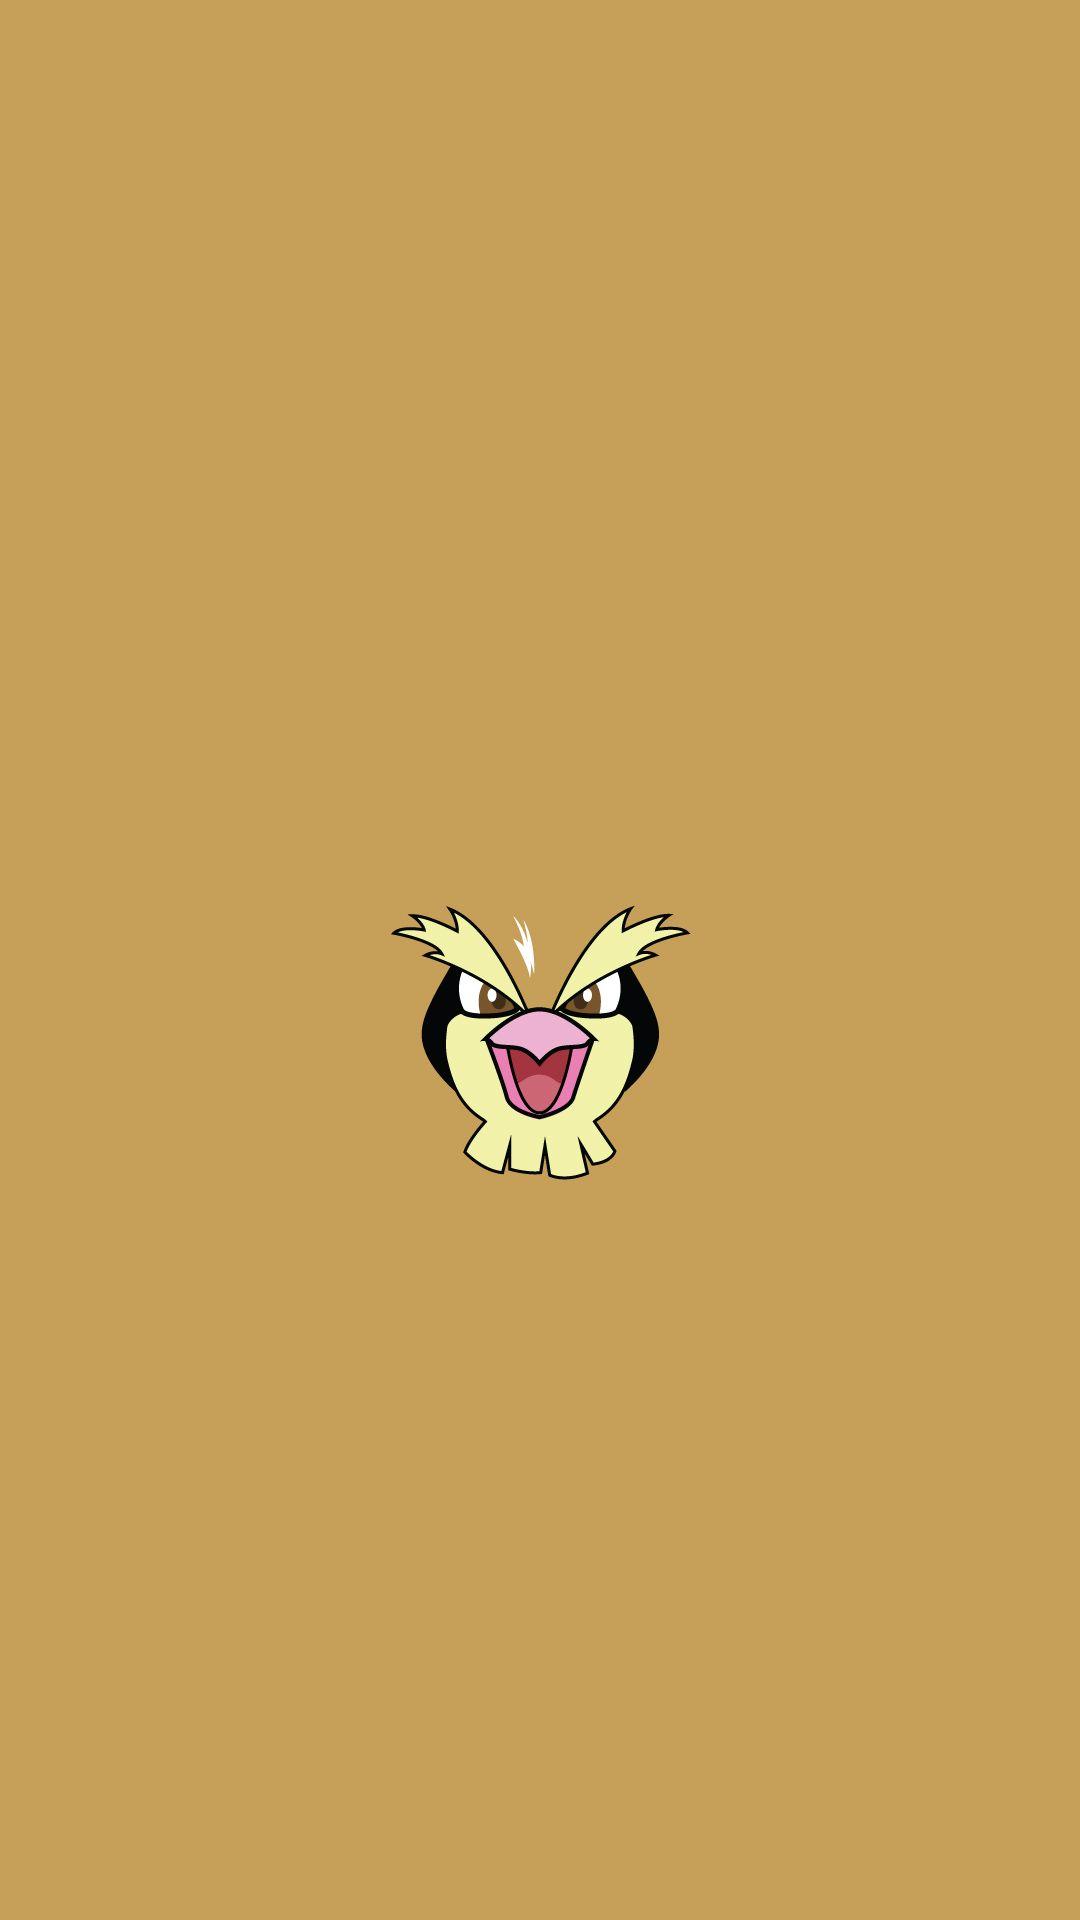 Pidgey Pokemon iPhone 6+ HD Wallpaper HD – Free Download | iPhoneWalls